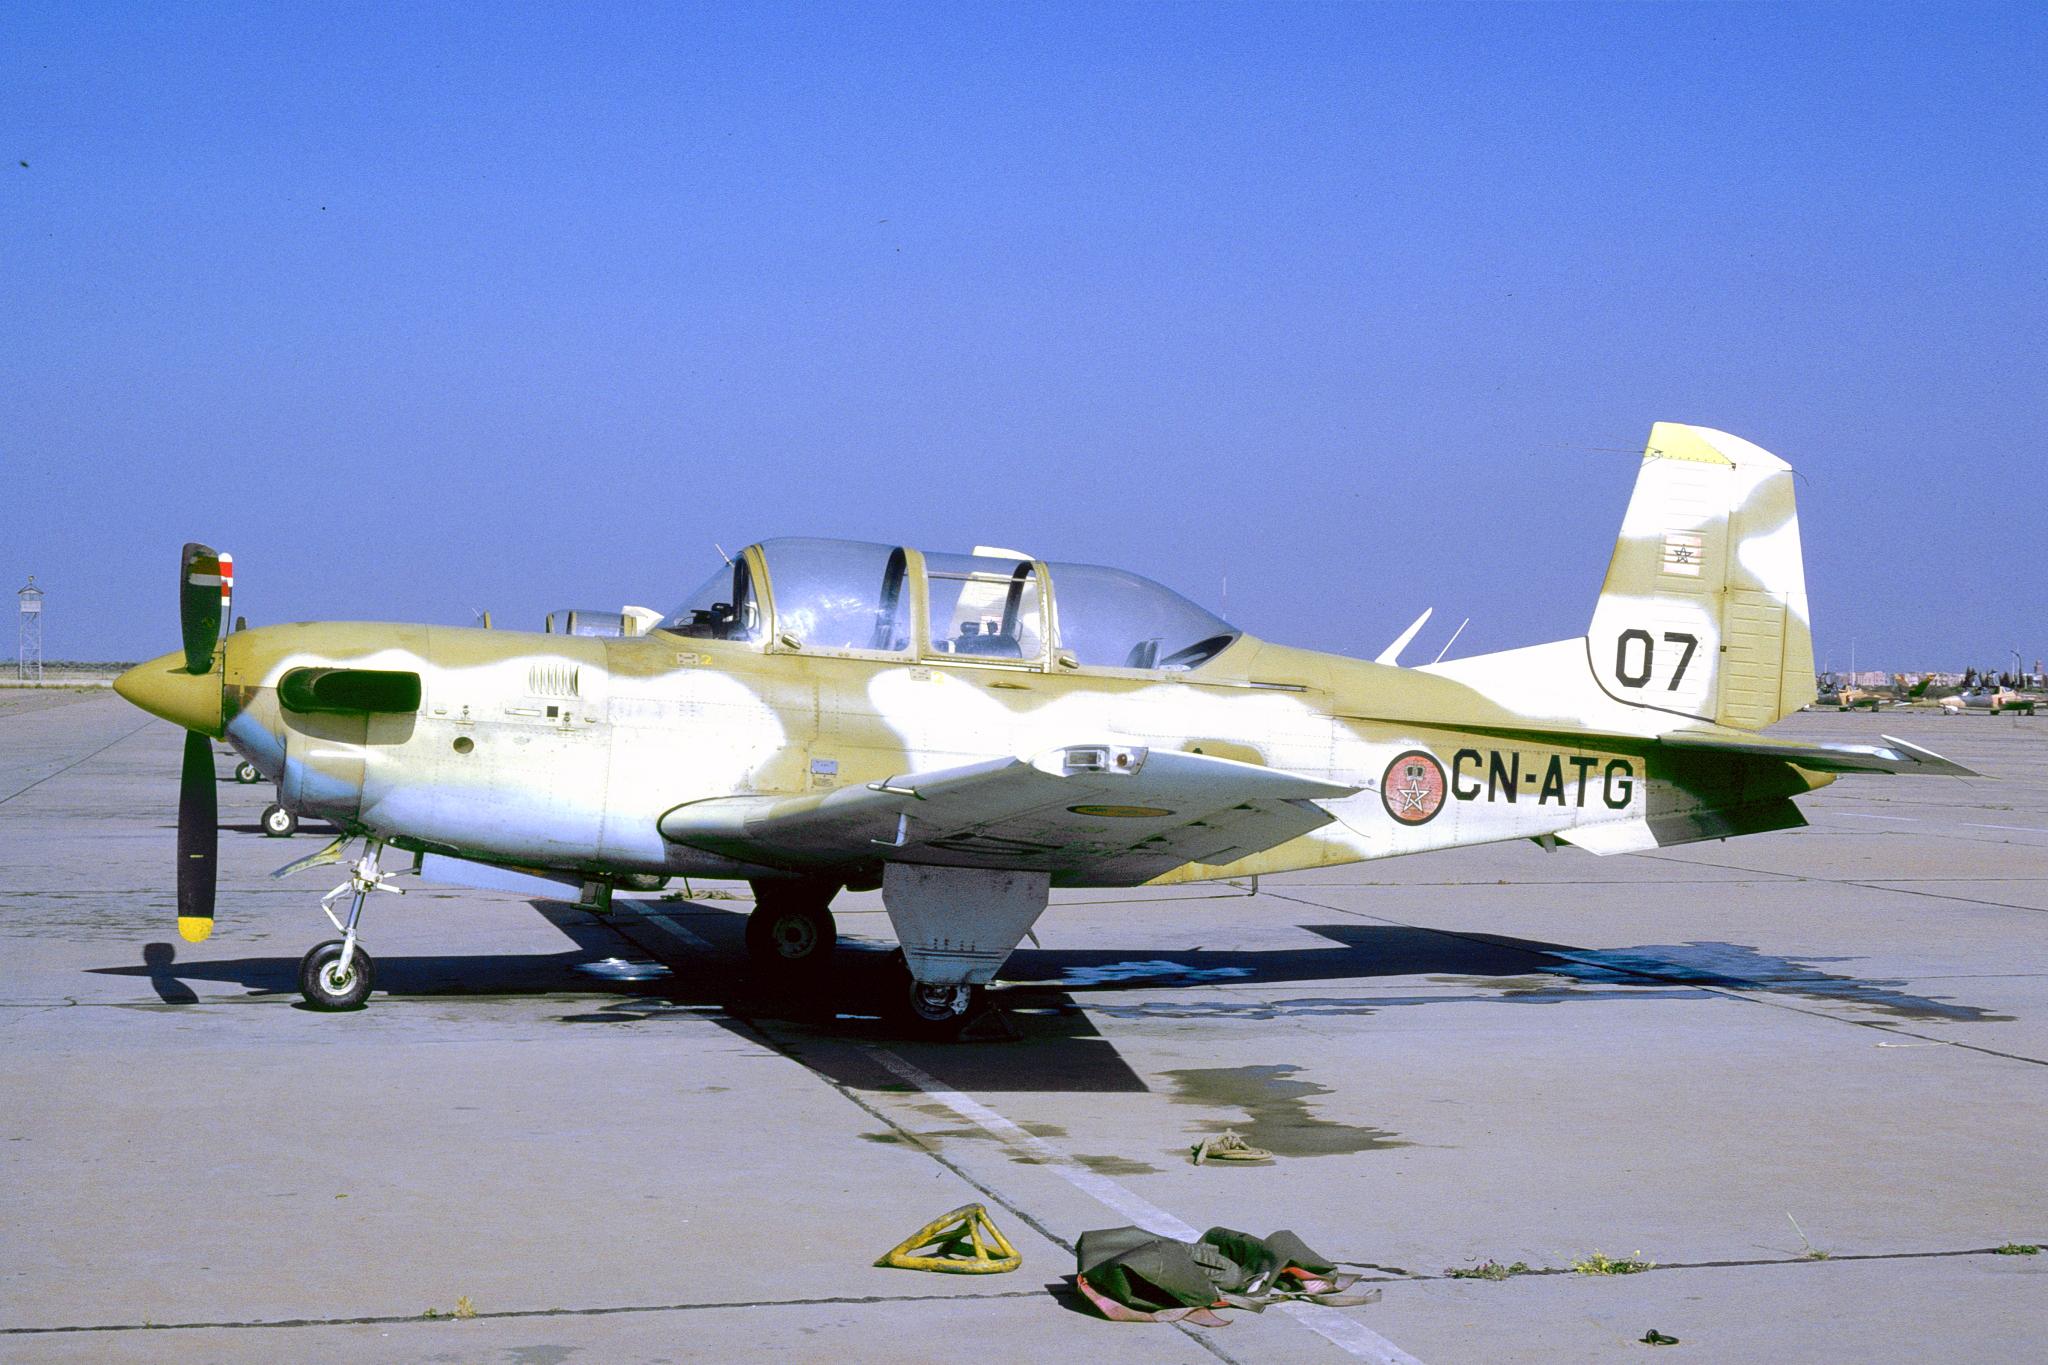 FRA: Photos anciens avions des FRA - Page 12 46329869304_8c0cde656d_o